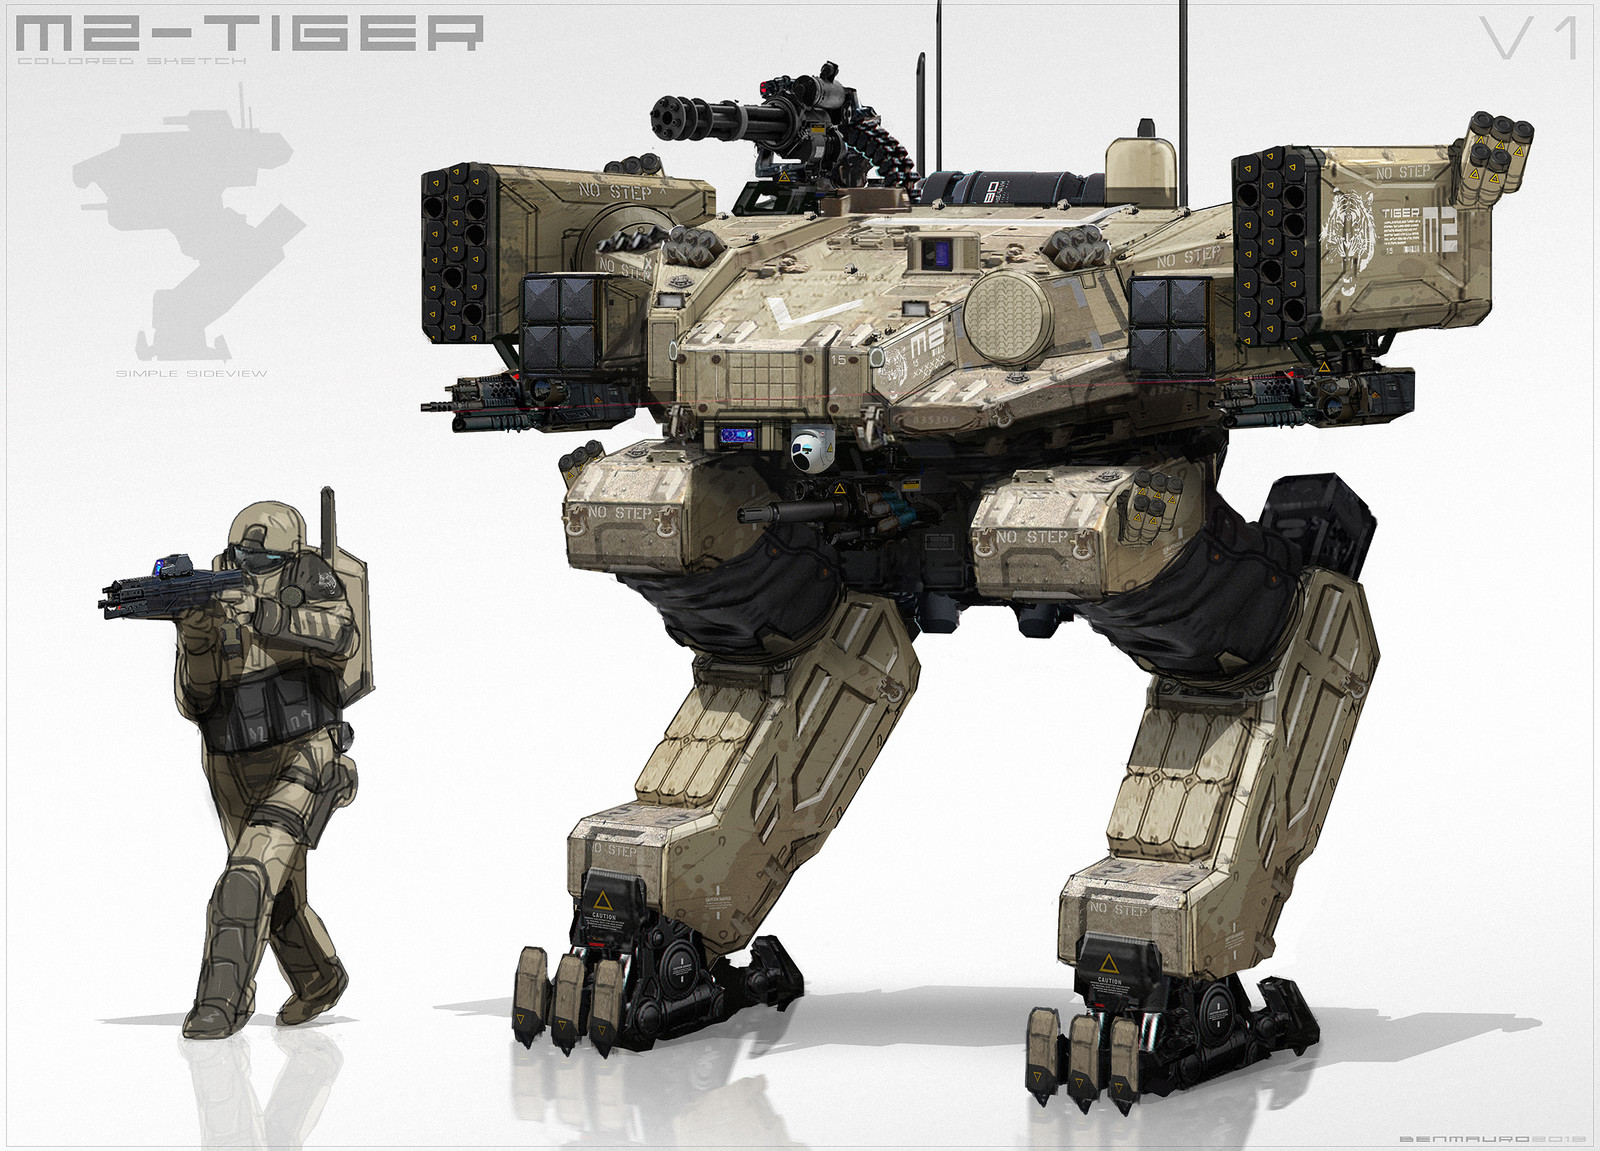 M2-TIGER